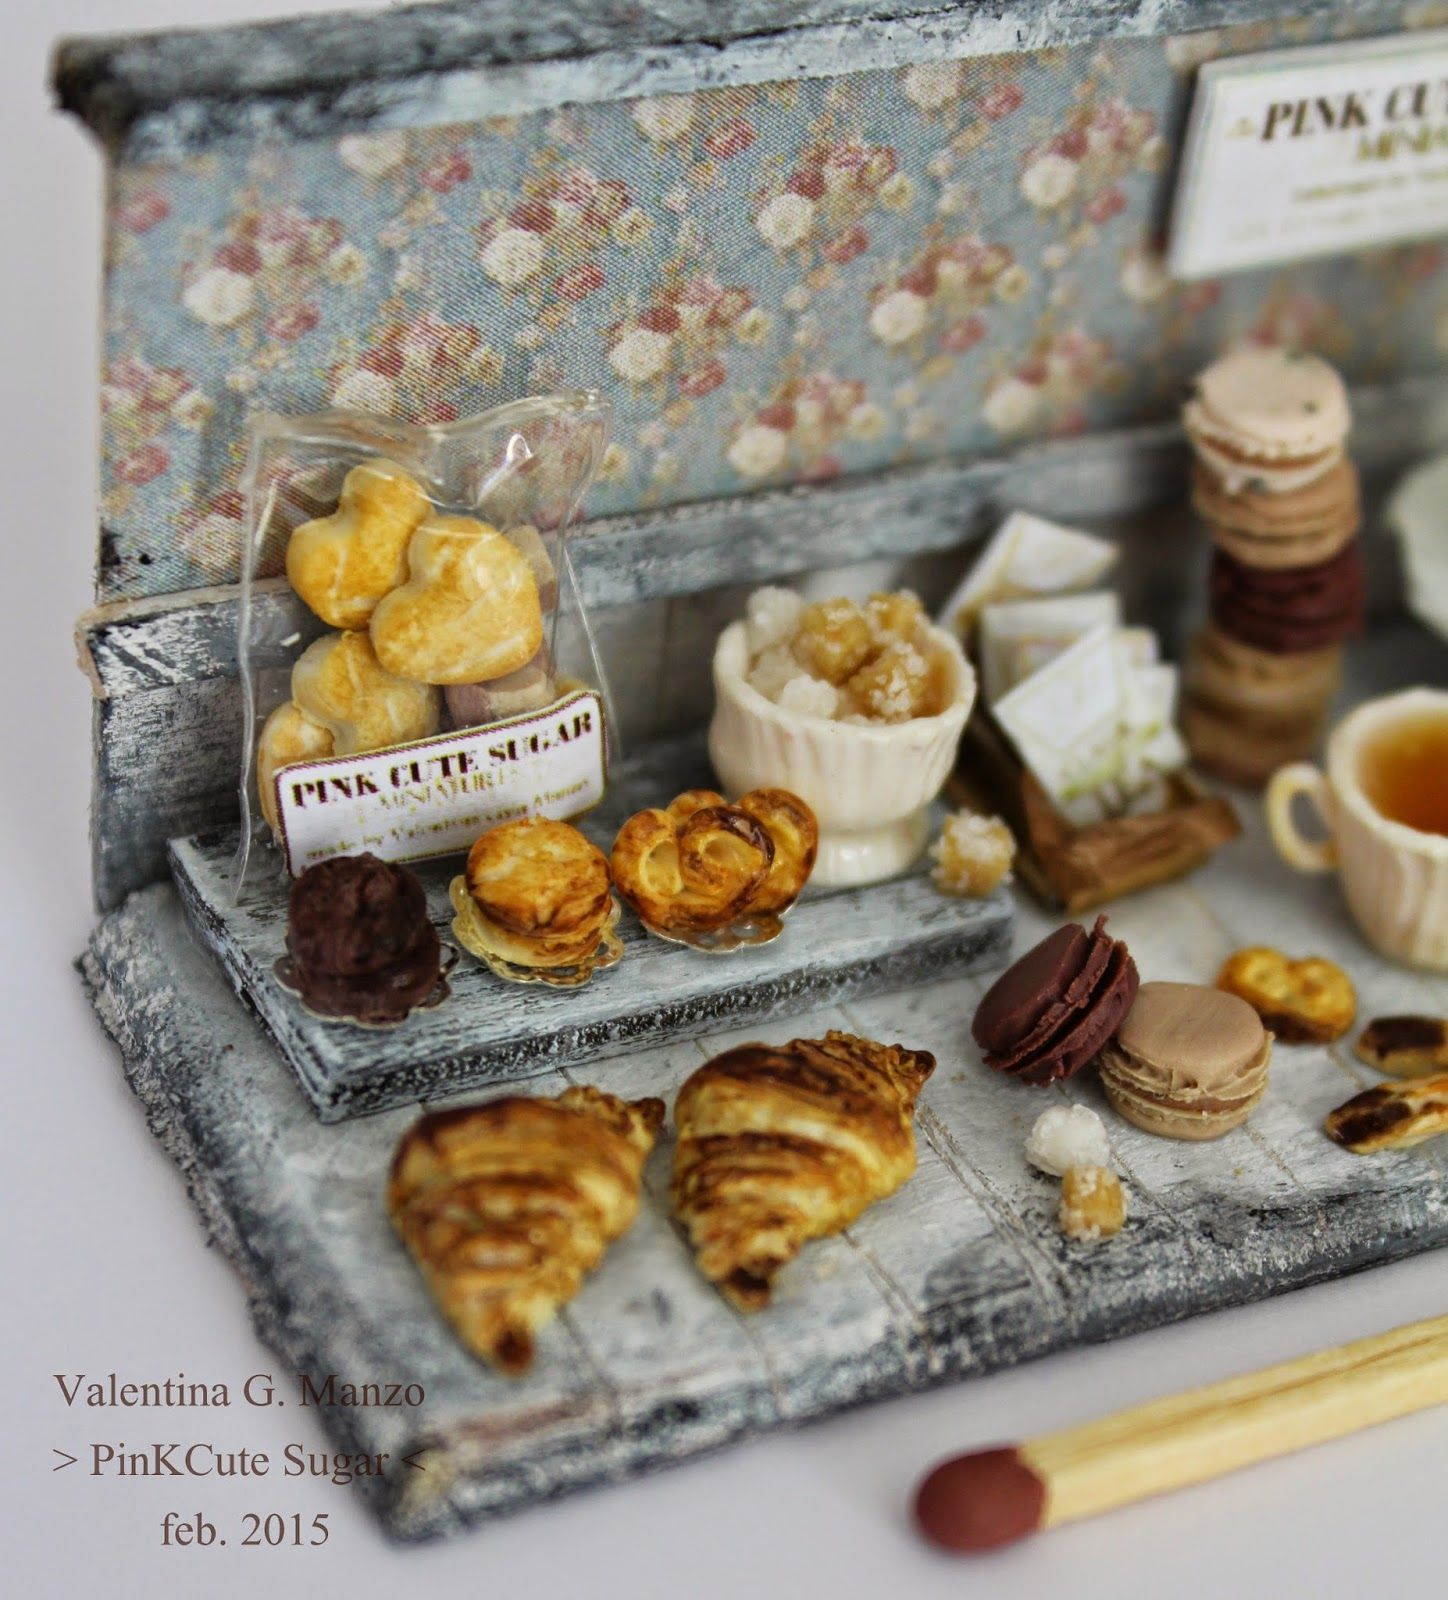 Valentina G. Manzo - PinkCute Sugar Miniatures: ➽ Miniature food